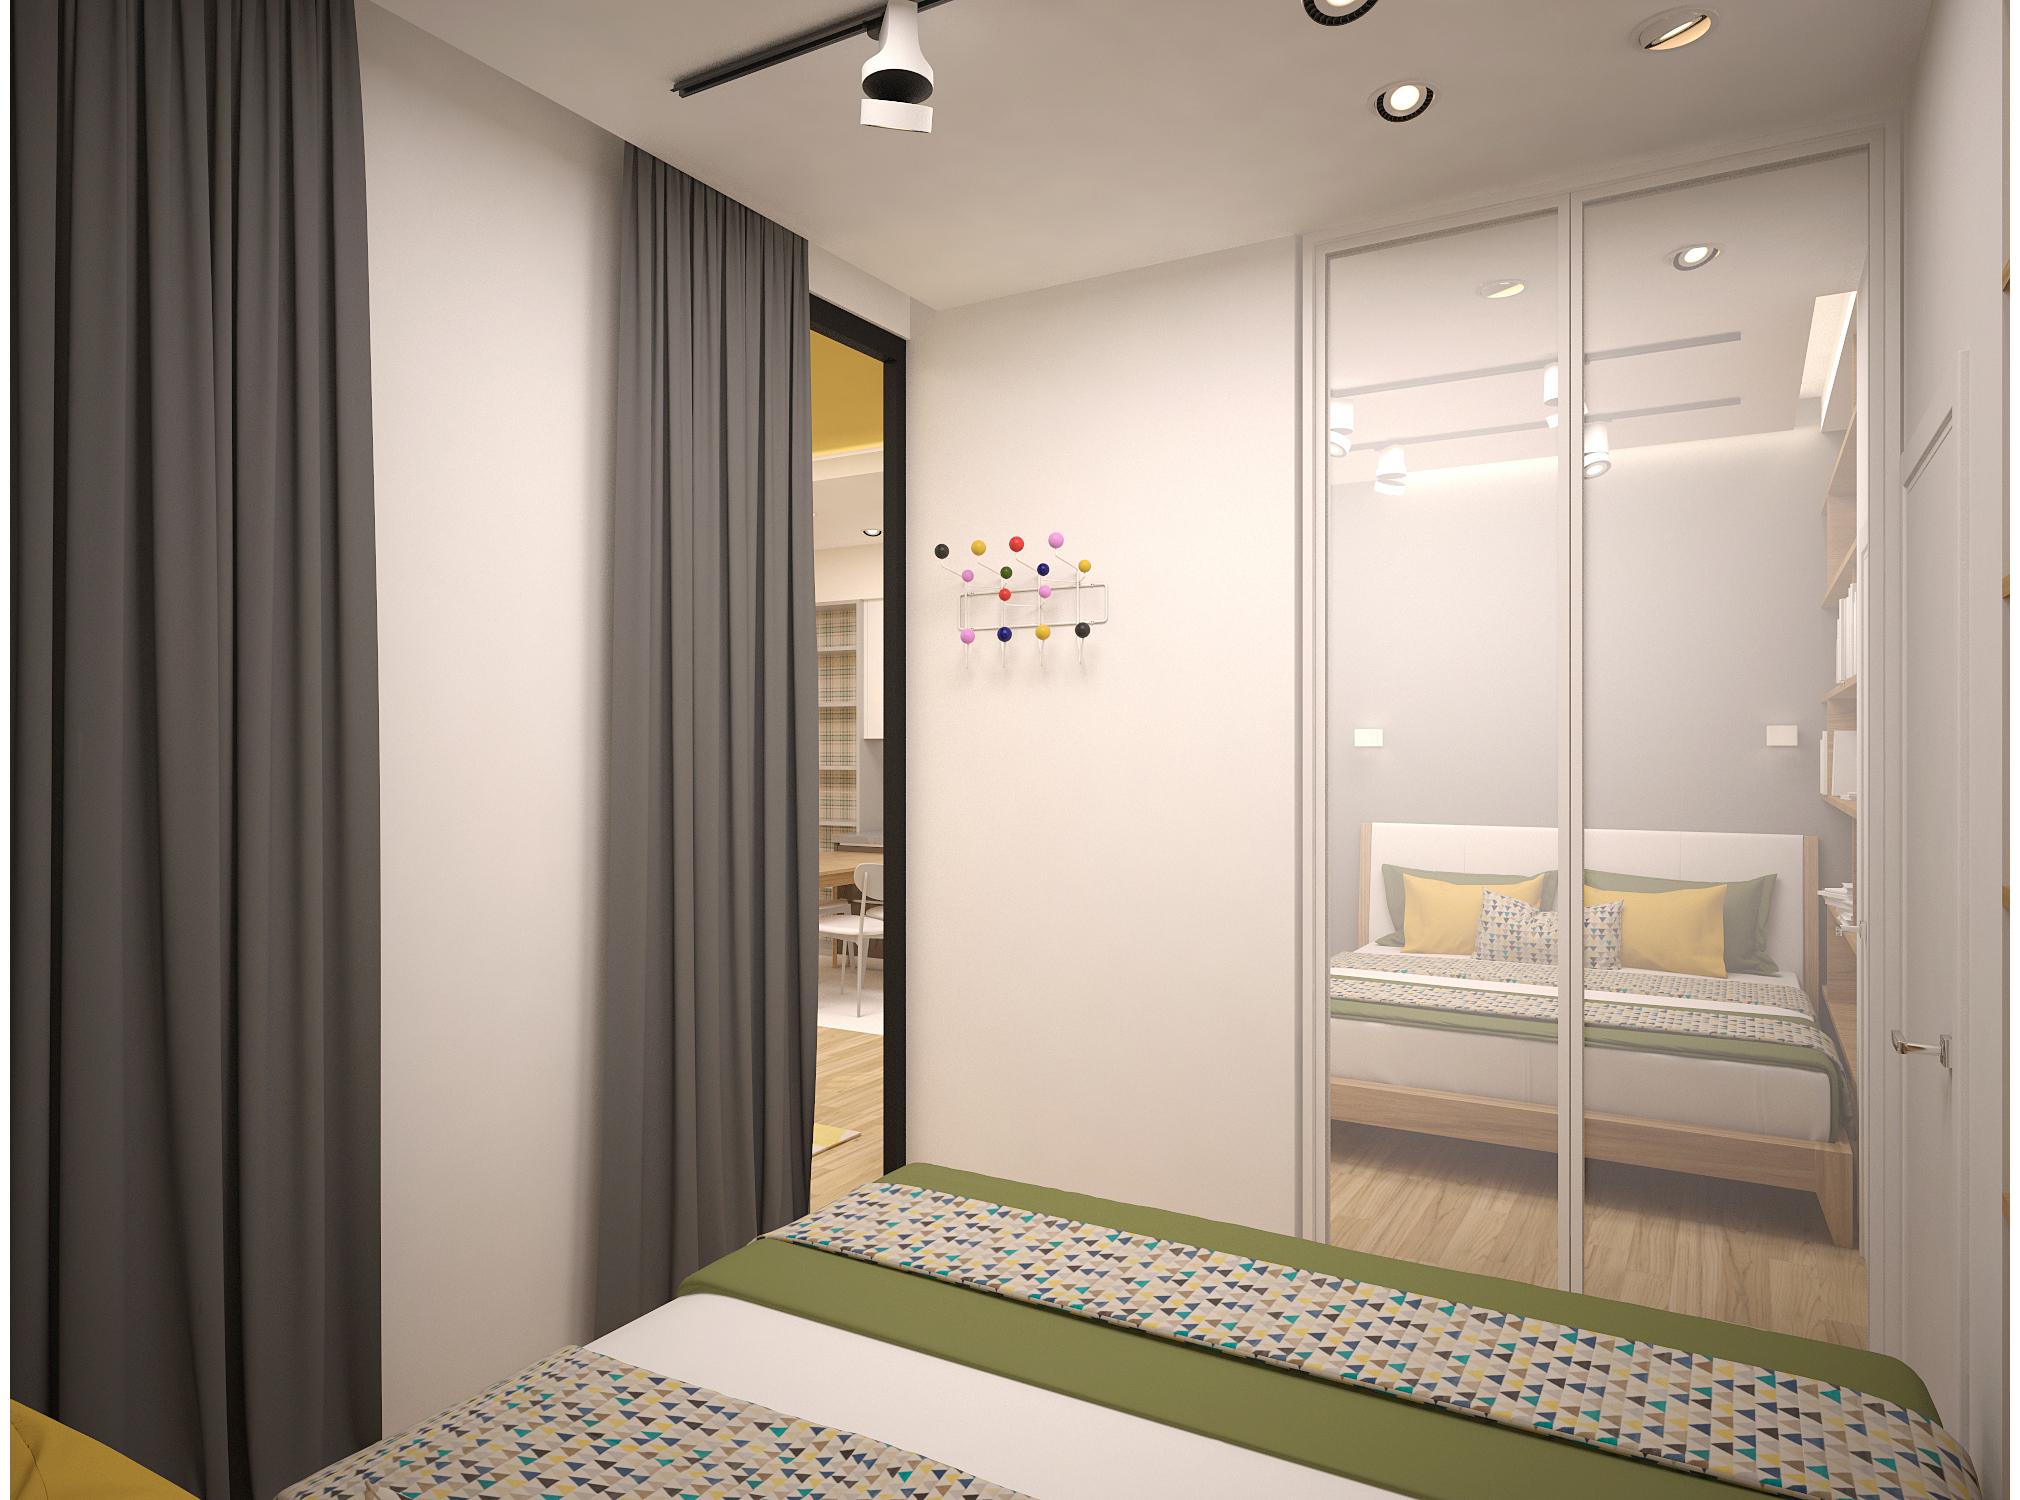 Copy of Scandinavian style small bedroom interior